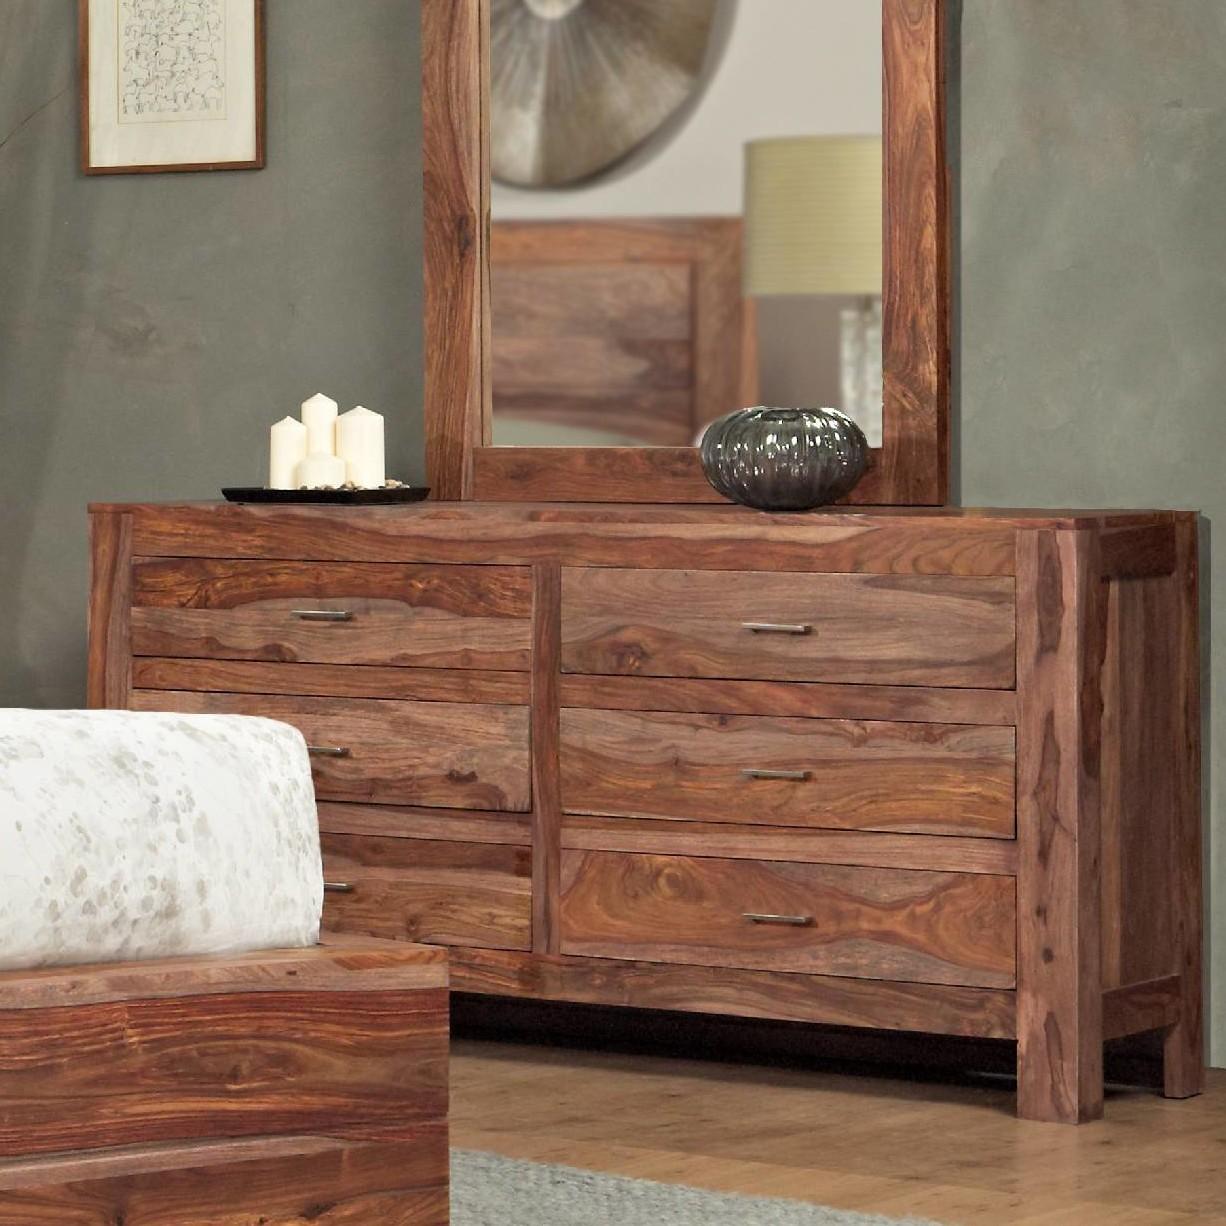 queen sofa beds clearance eero saarinen sofabord atria platform bed star modern furniture